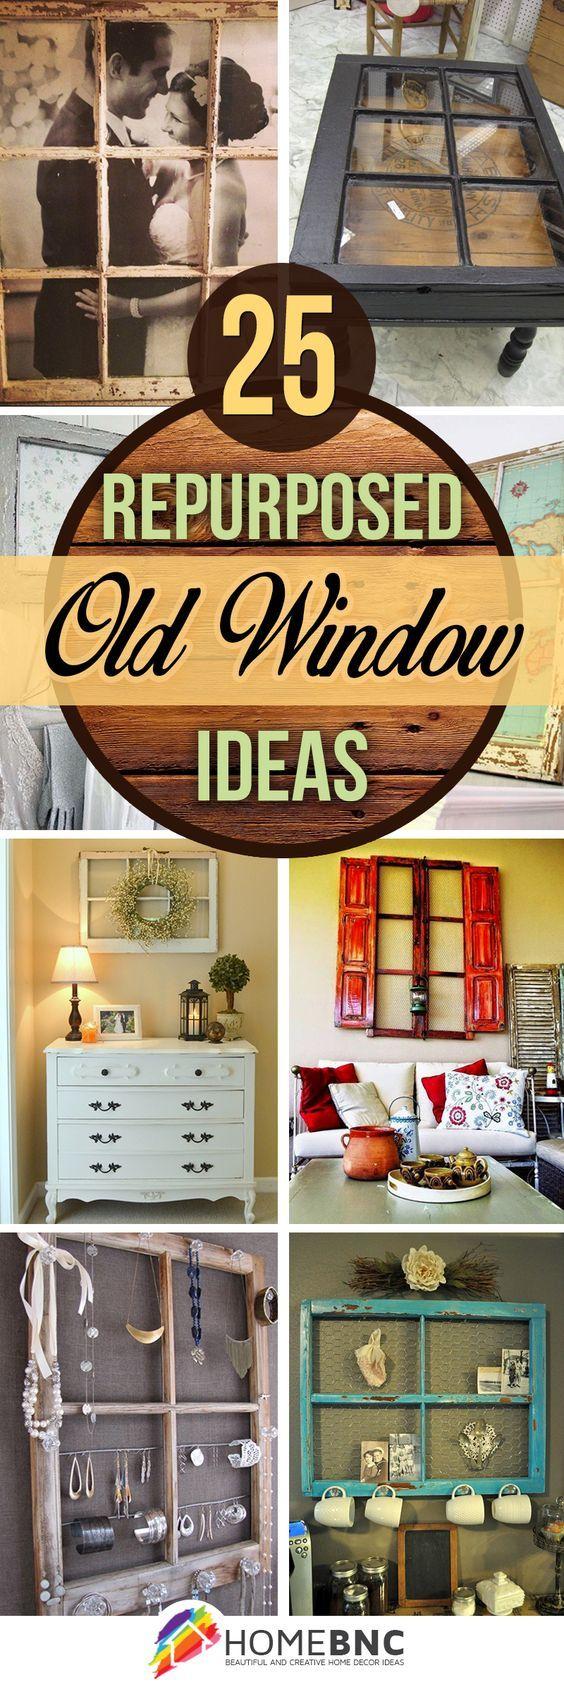 House window grill design 2018   best window ideas images on pinterest  old windows antique